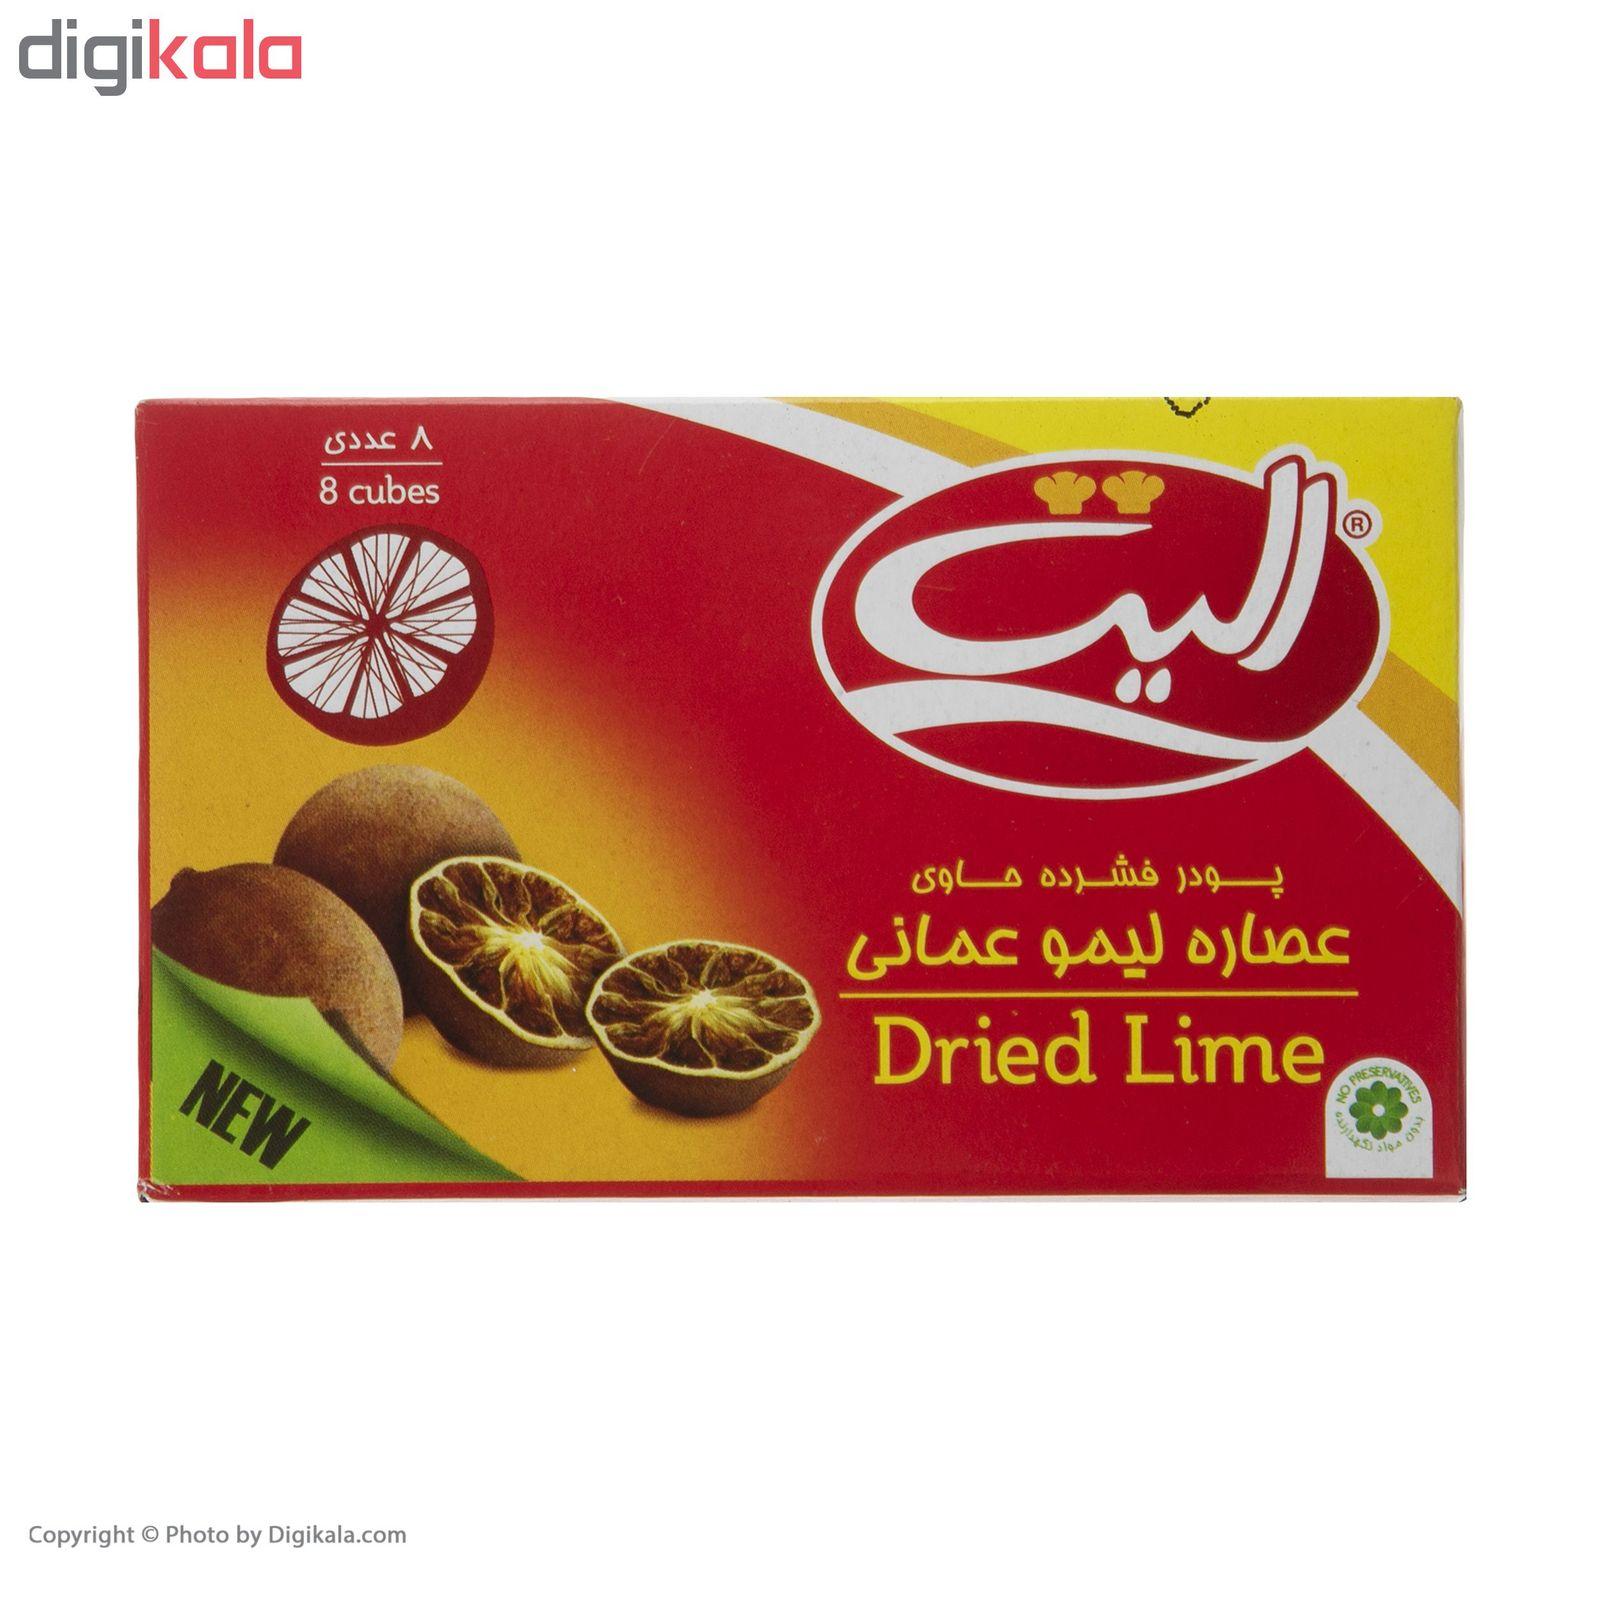 پودر عصاره لیمو عمانی الیت مقدار 80 گرم main 1 1